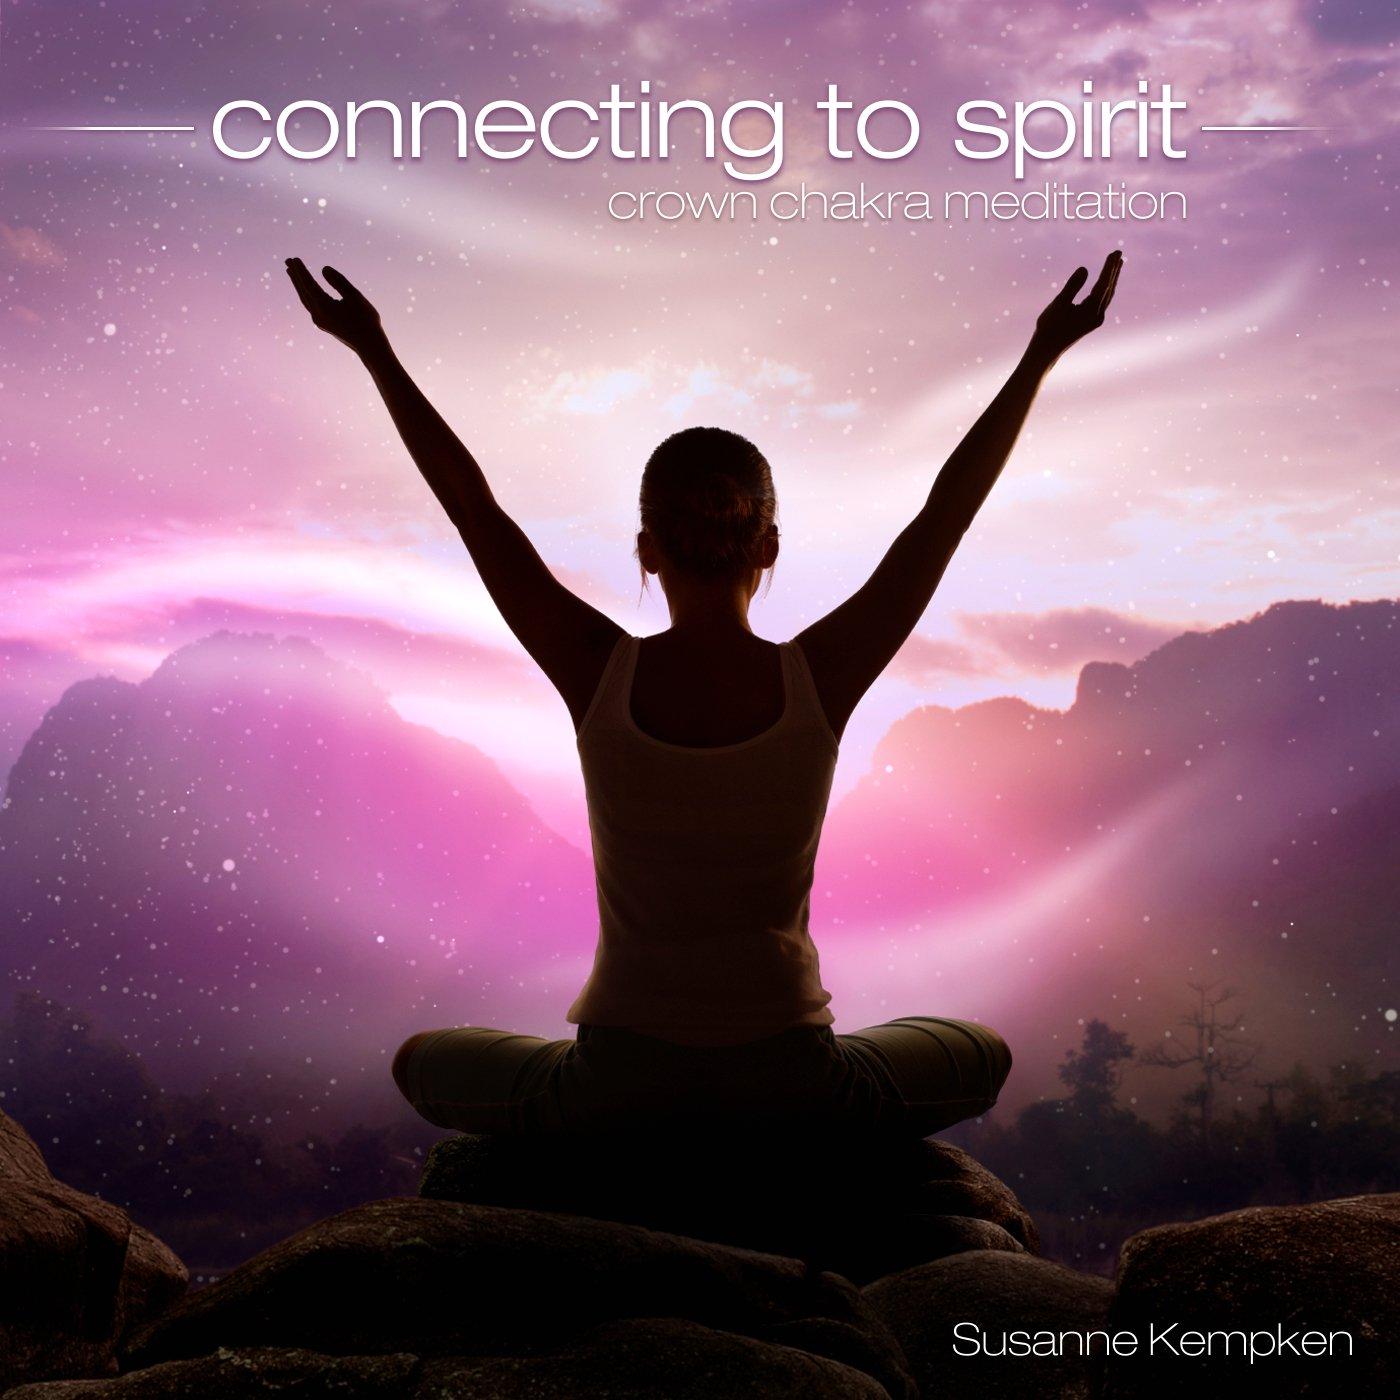 Connecting to Spirit - Crown Chakra Meditation By Susanne Kempken